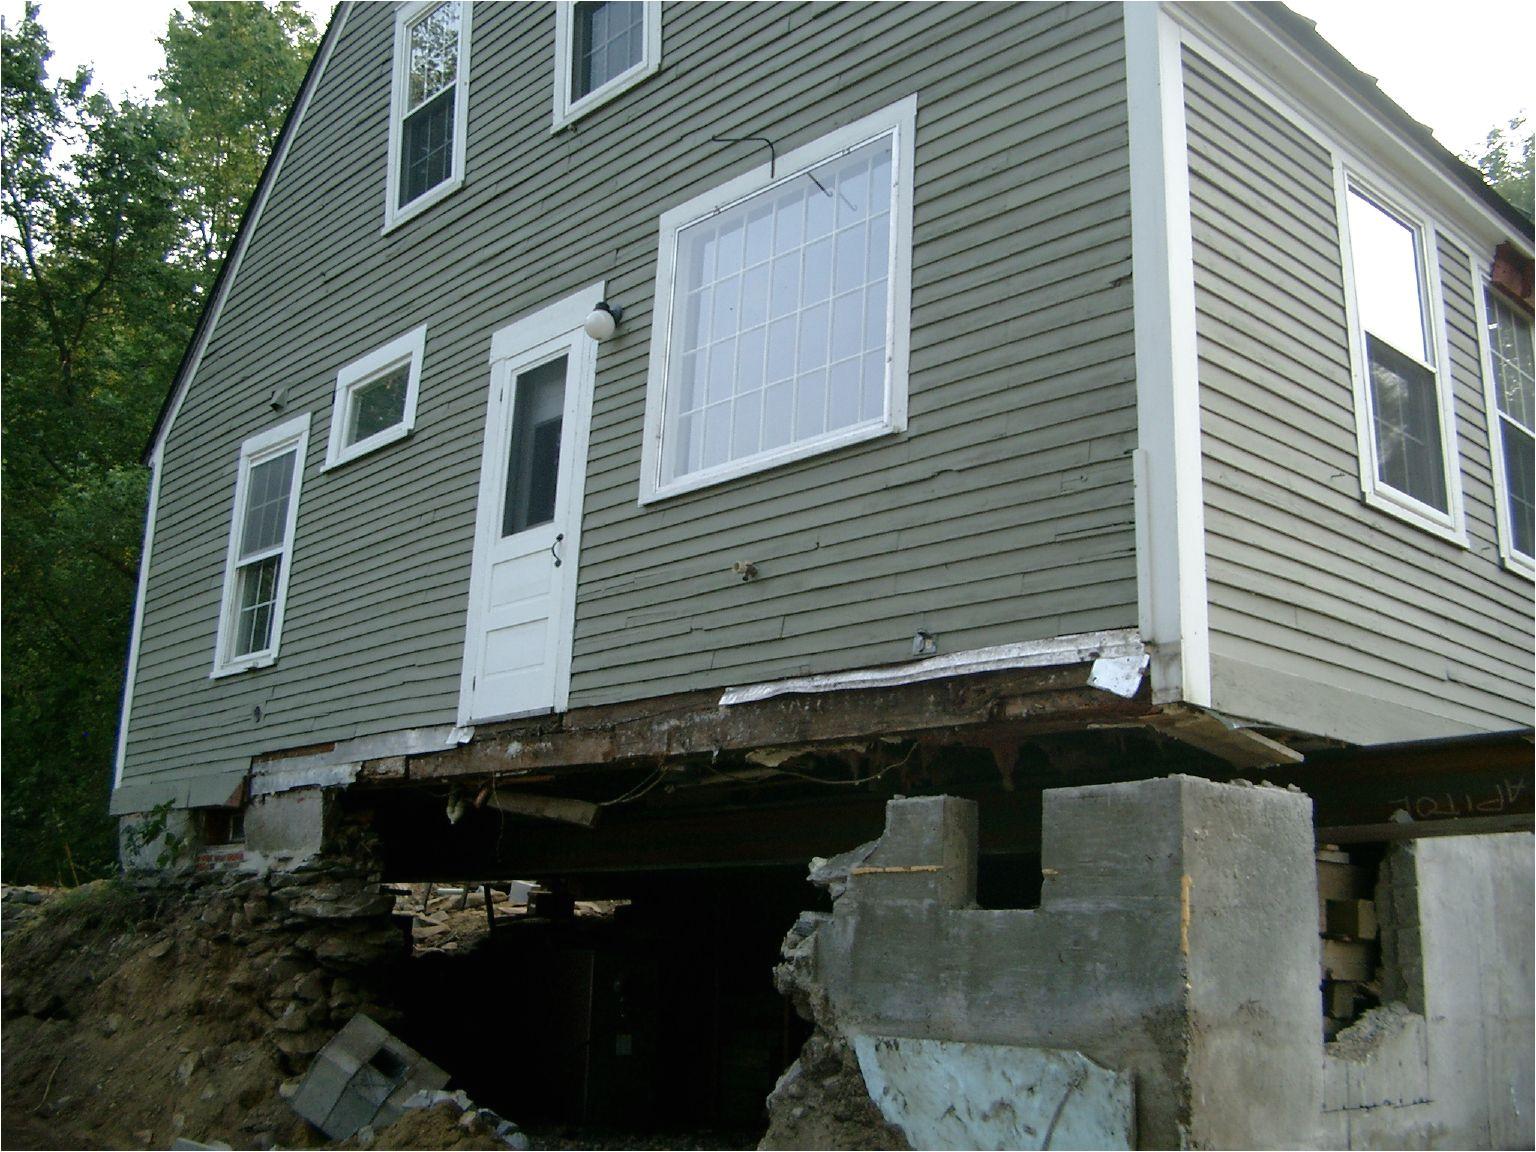 house jacked up 43264197 be692e588a o 58b7a13a5f9b588080c846f0 jpg